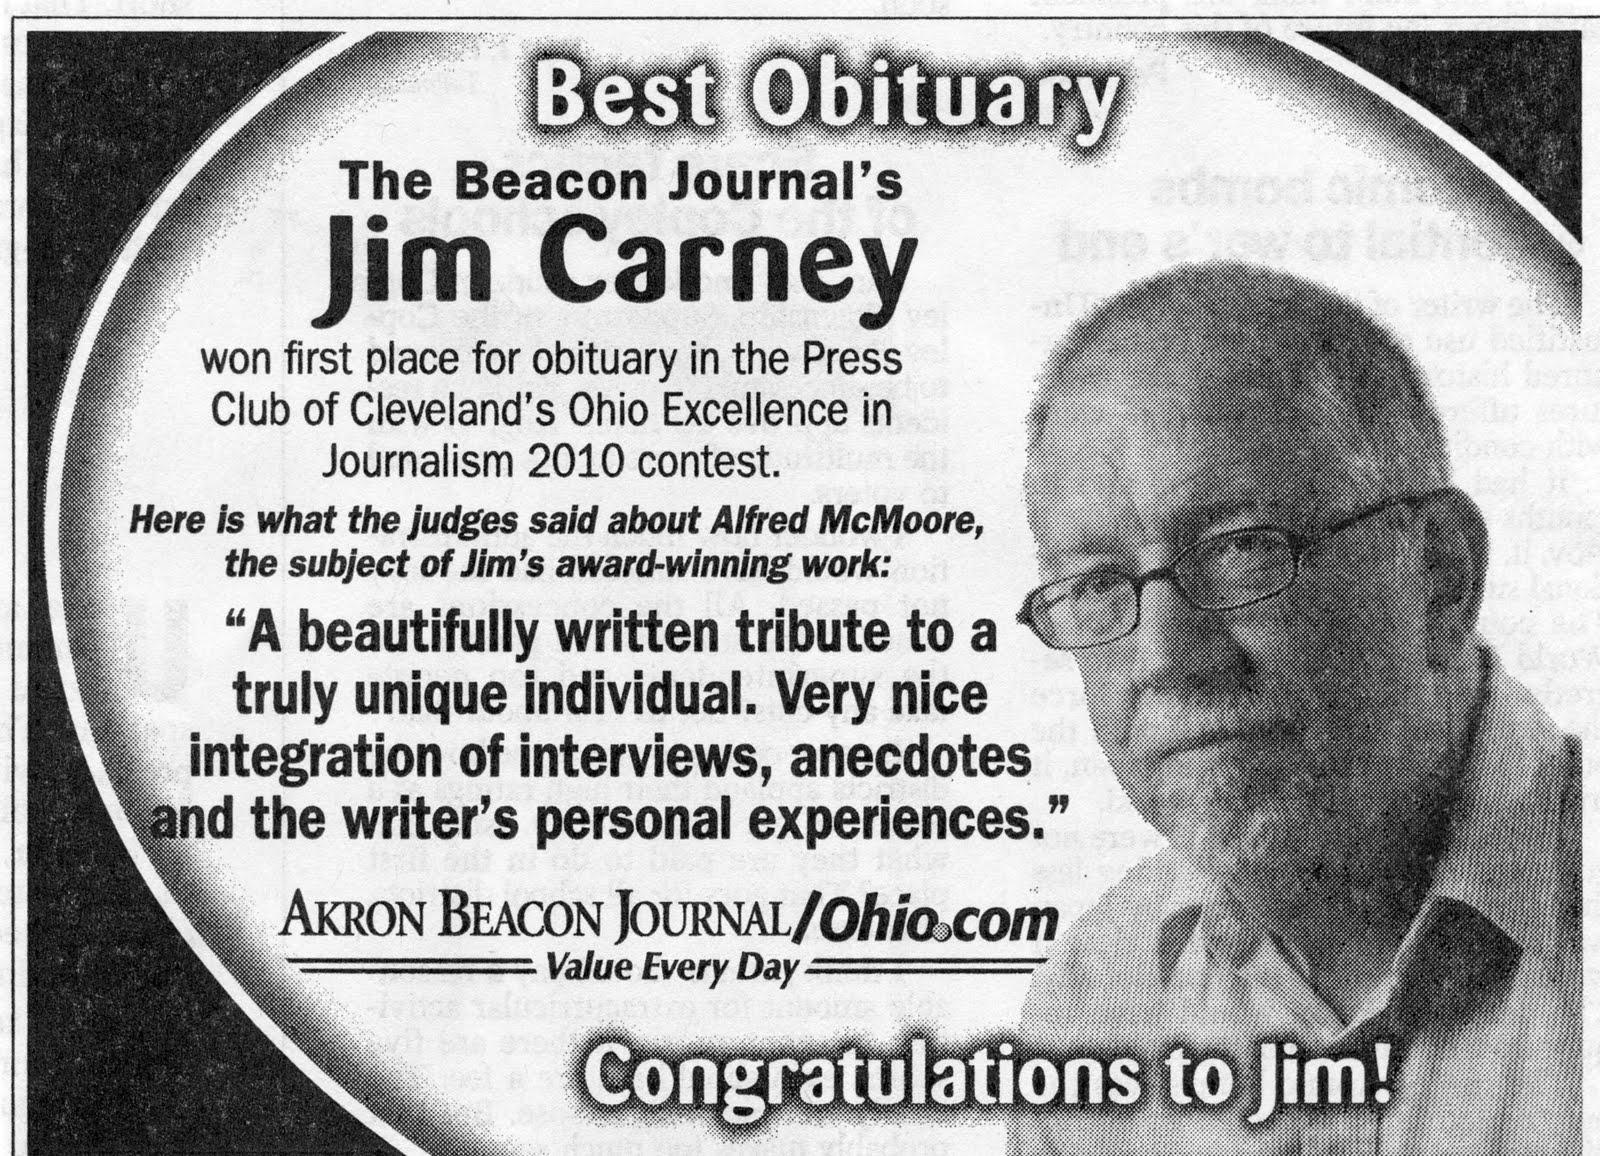 Bj Alums Bj Promo Ad Touts Award To Jim Carney